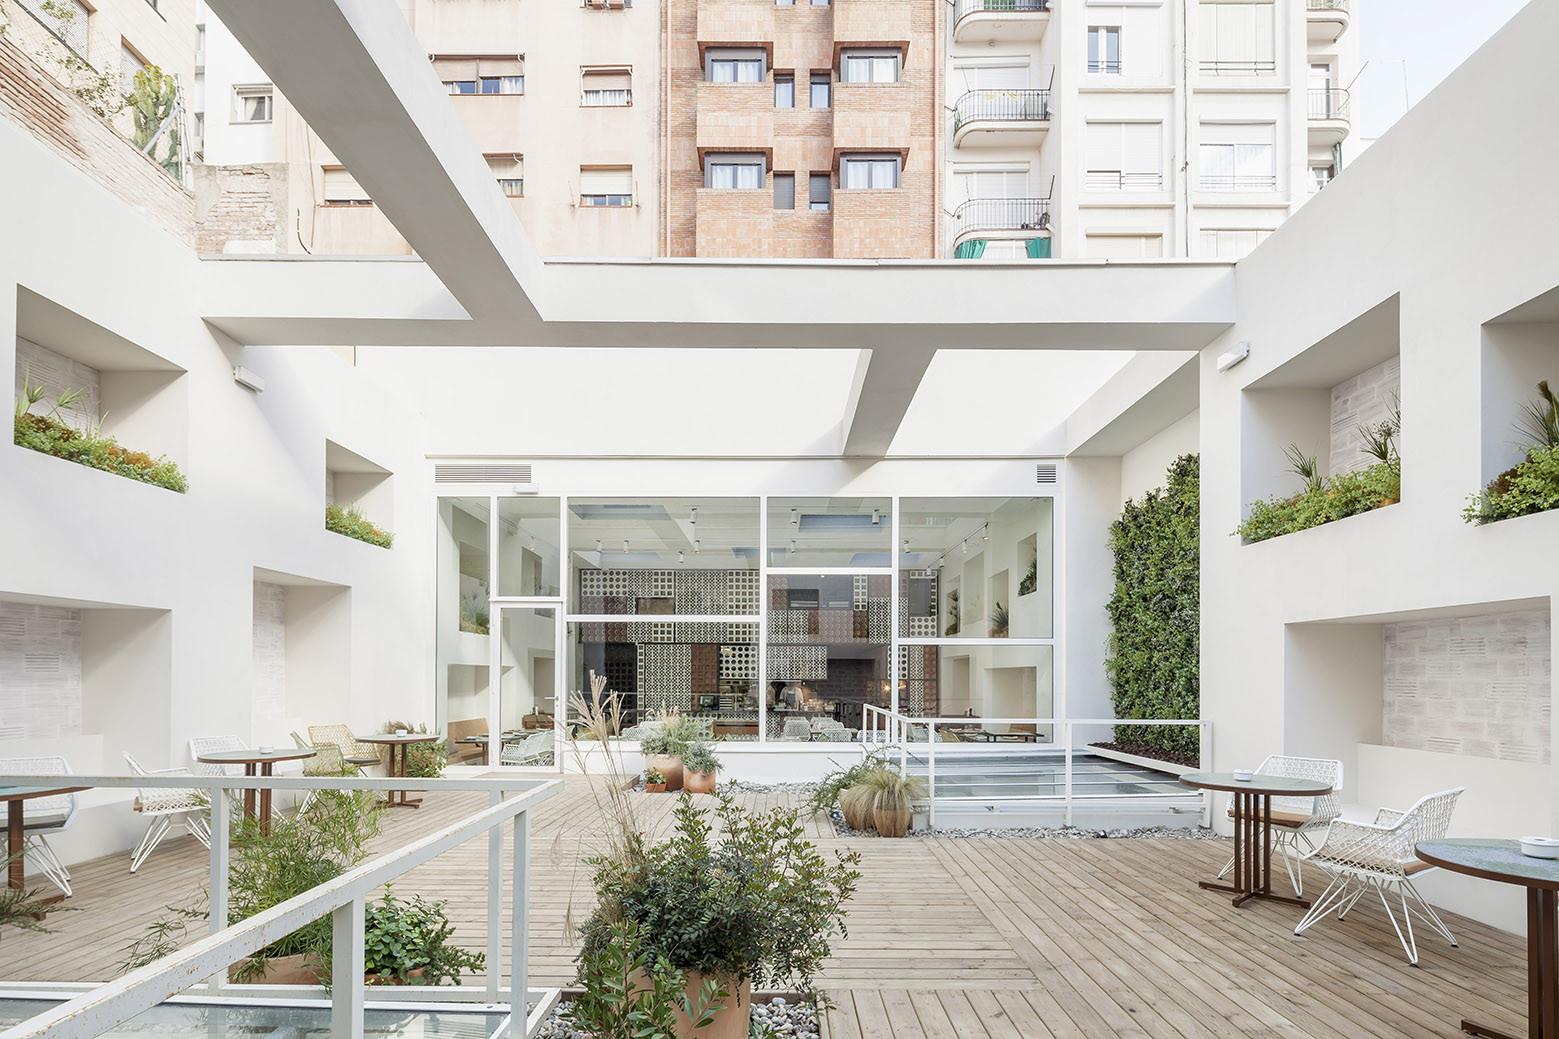 طراحی رستوران کاتالانی با عنوان لذت - Disfrutar Restaurant 6 1